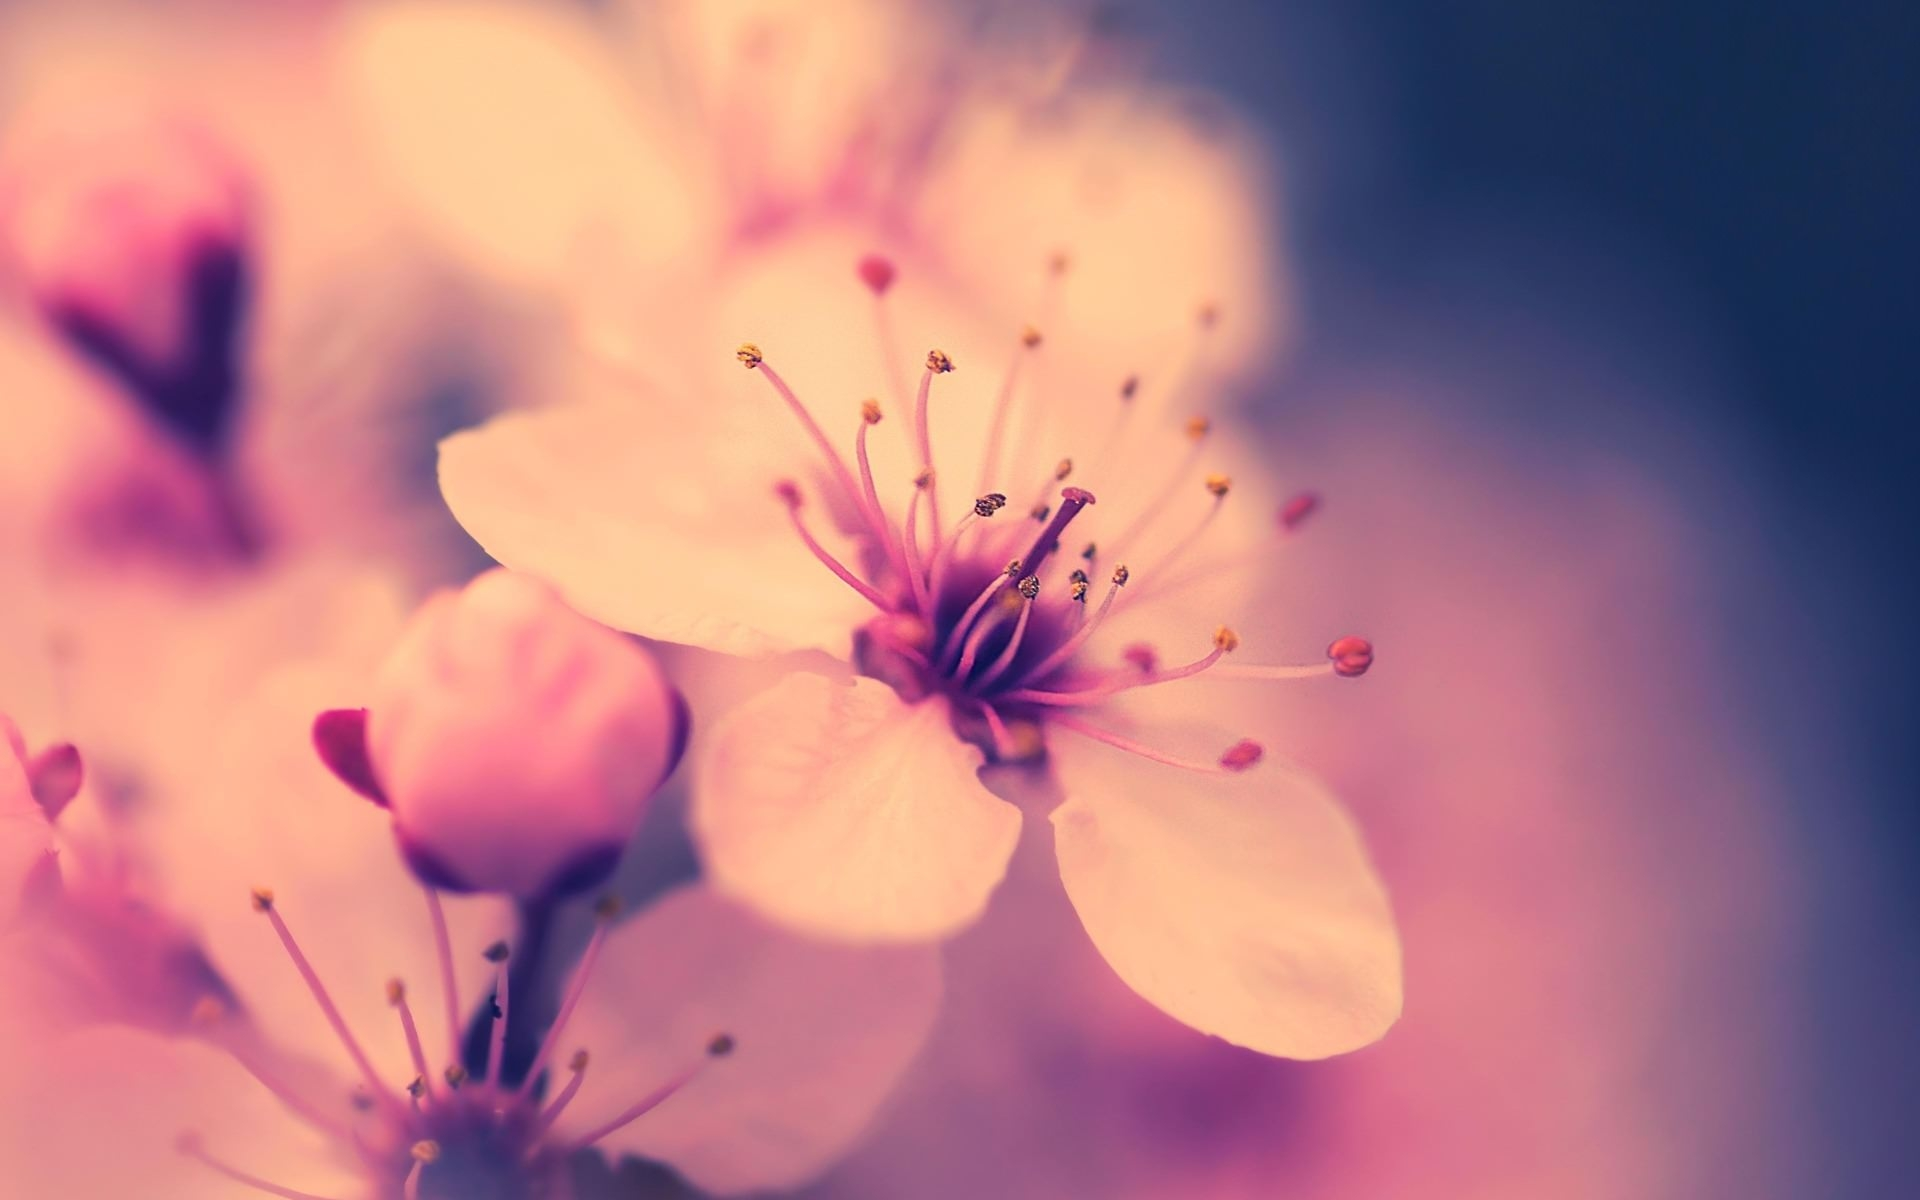 Amazing Cherry Blossom Background